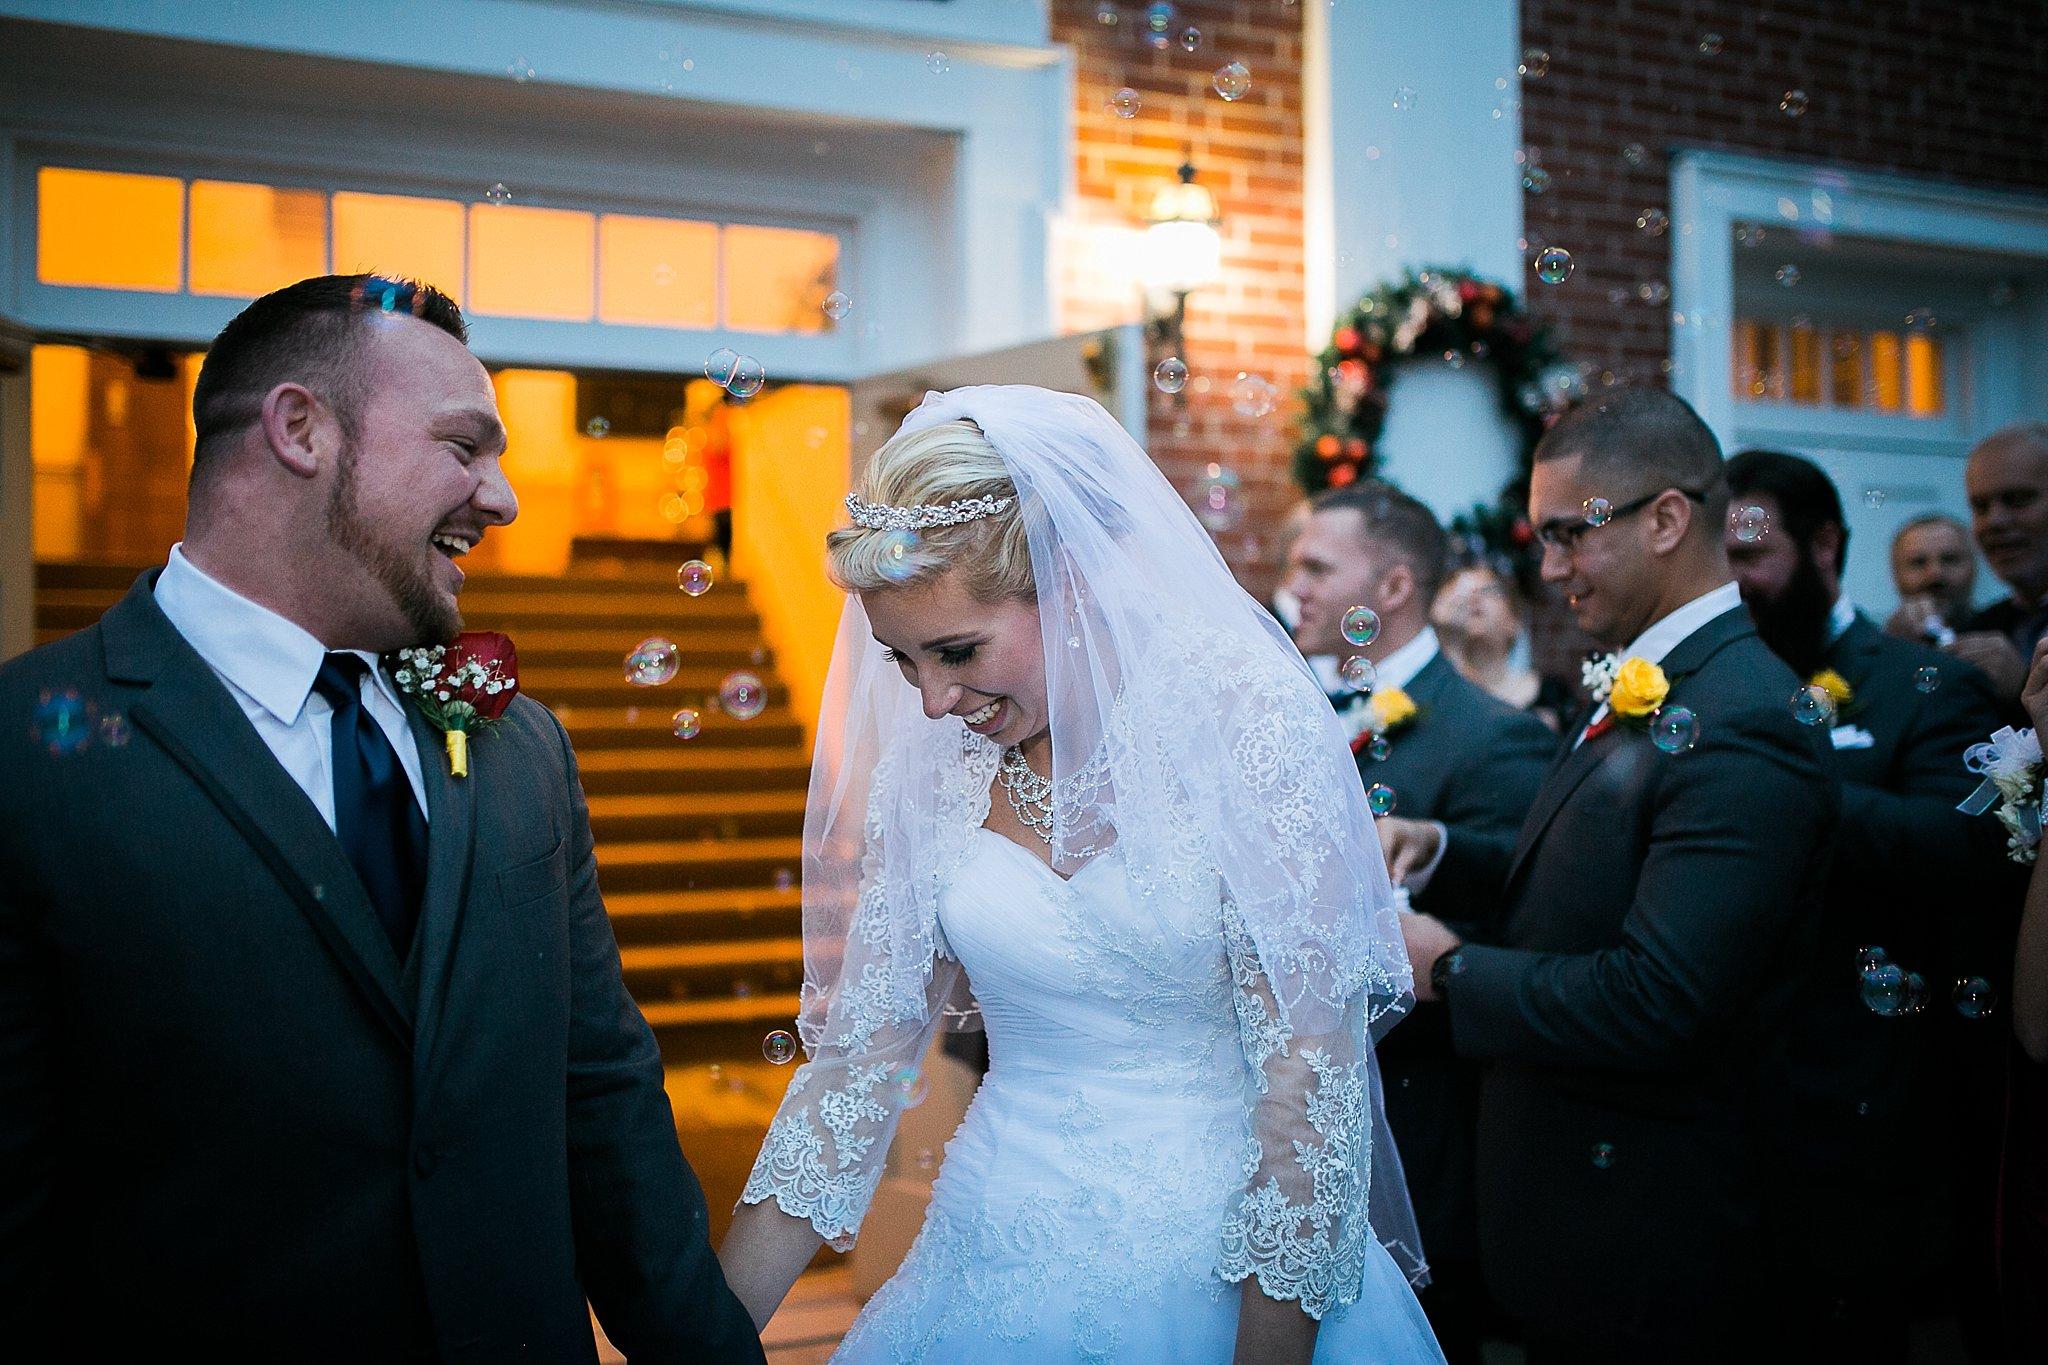 Wollaston Church of the Nazarene Wedding Boston Wedding Photographer29.jpg